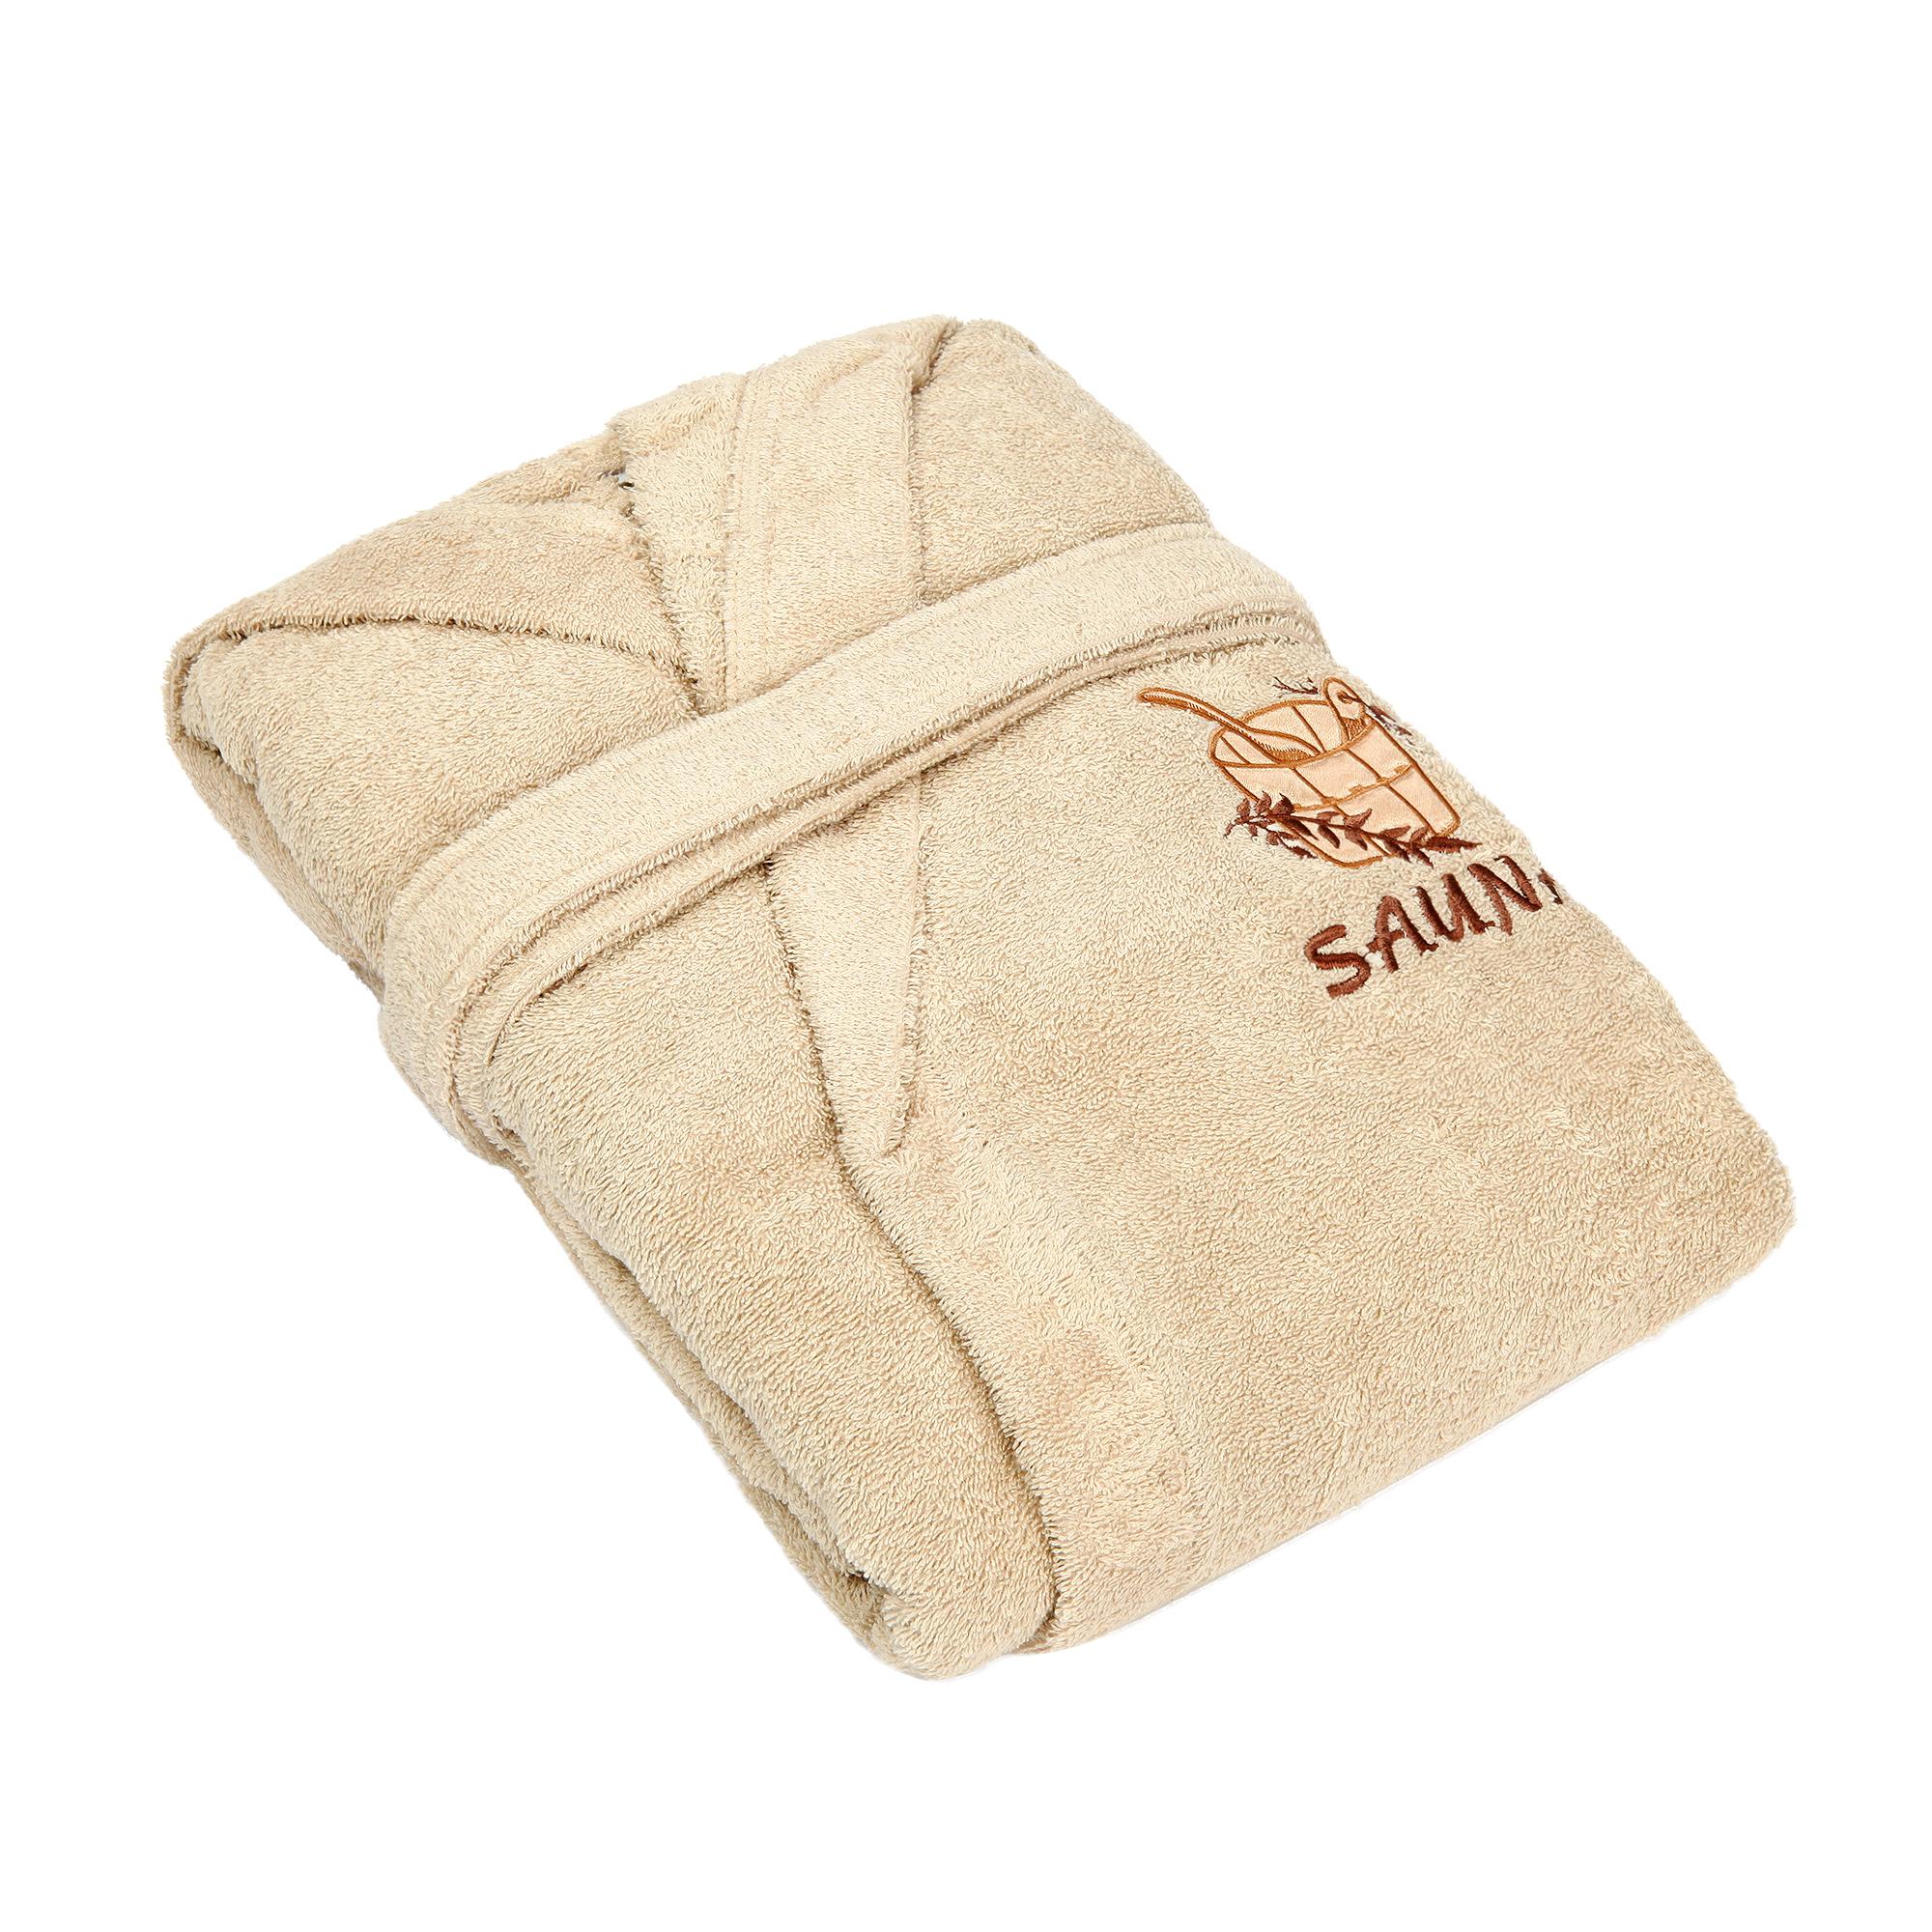 халат roberto cavalli araldico xxl brown Халат мужской Asil sauna brown xxl махровый с капюшоном